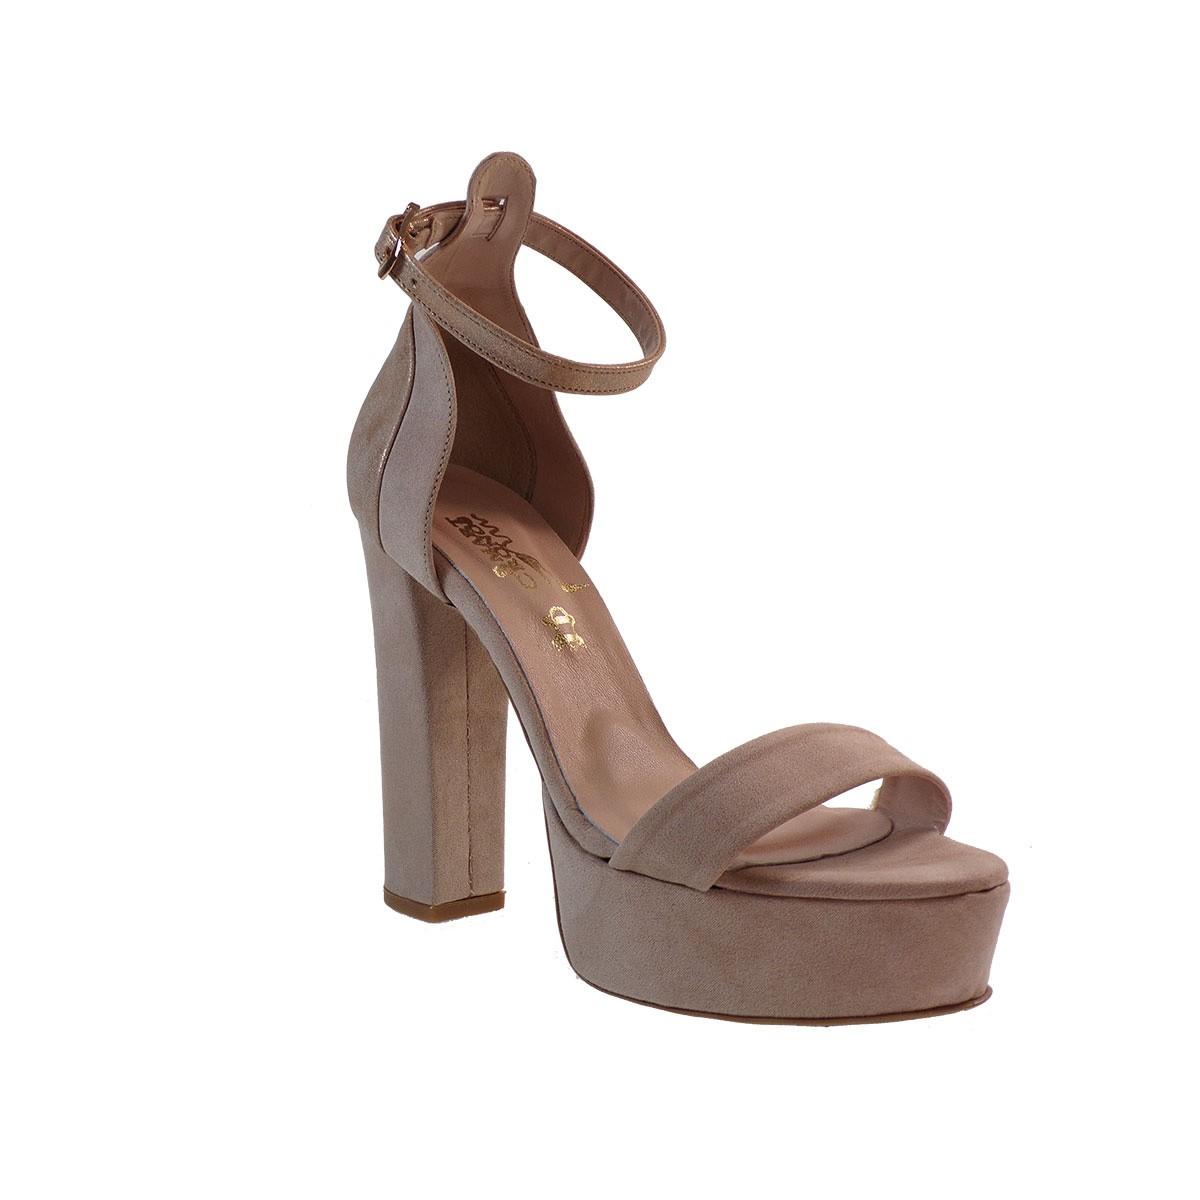 Smart Cronos Γυναικεία Παπούτσια Πέδιλα 6816-3597 Μπέζ-ρόζ-χρυσό Καστόρι Δέρμα